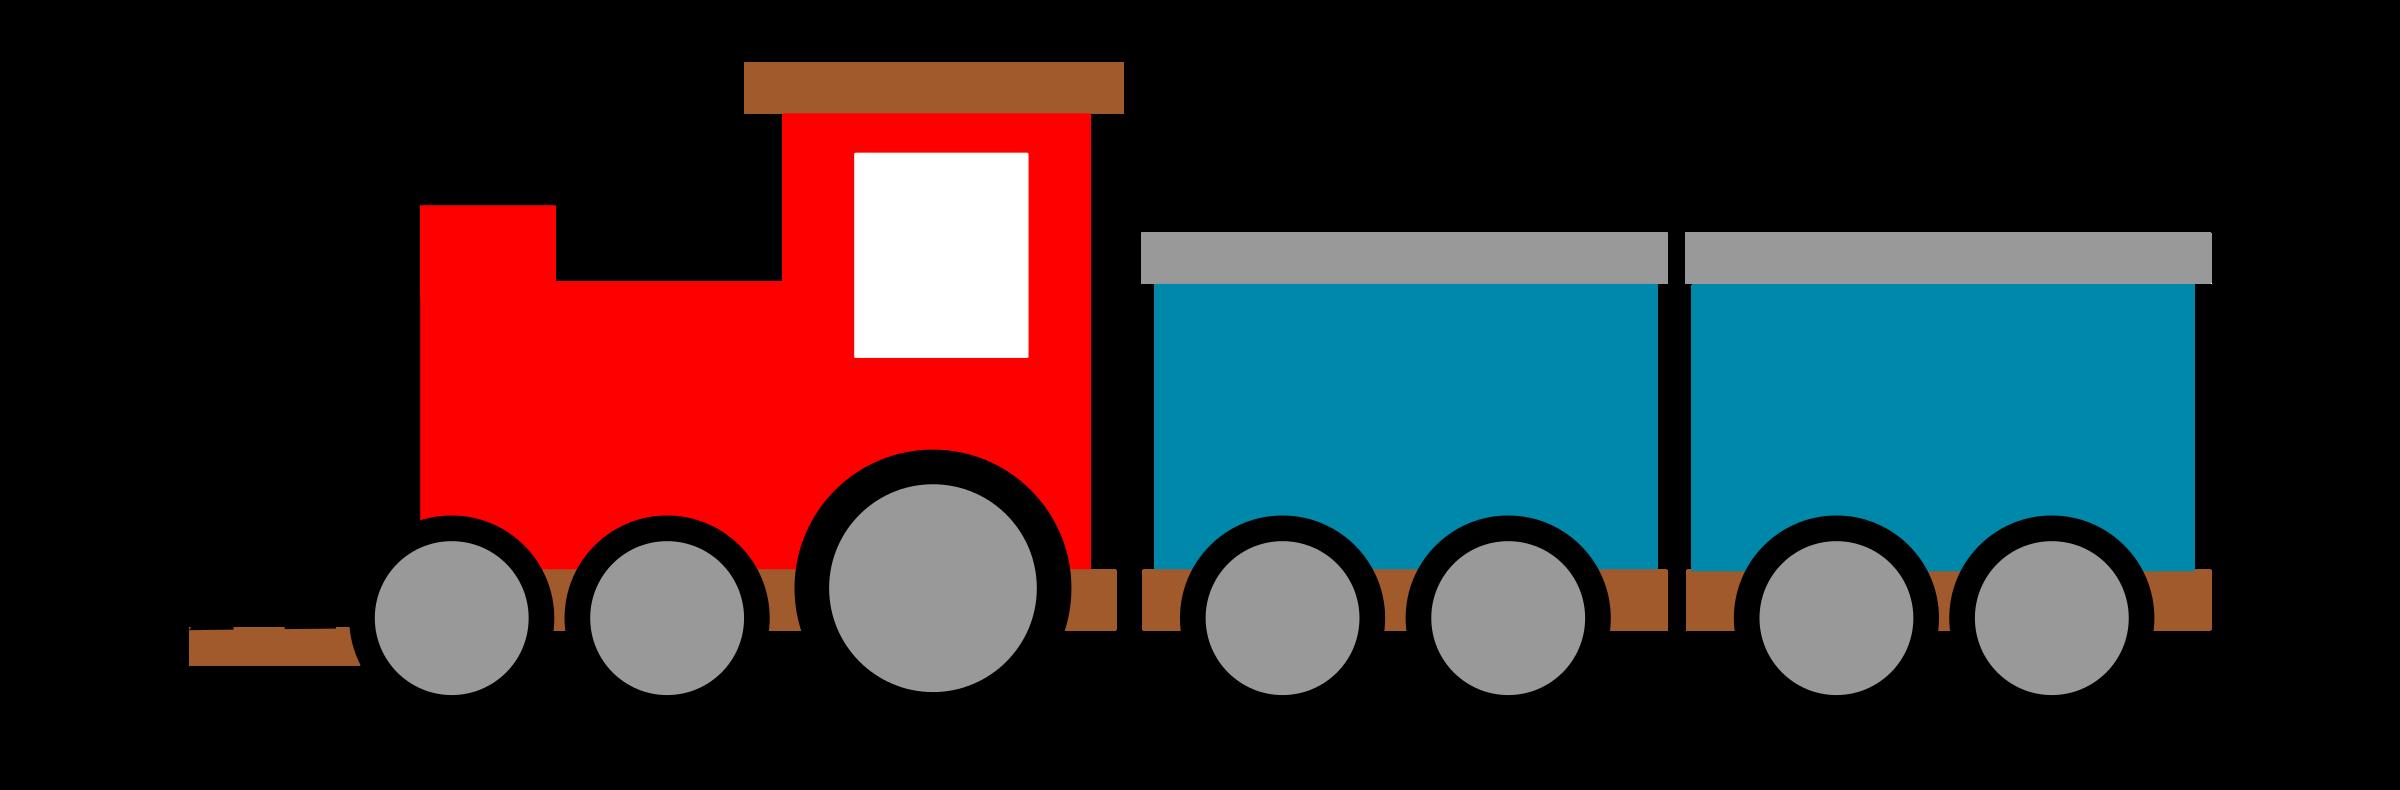 train clipart